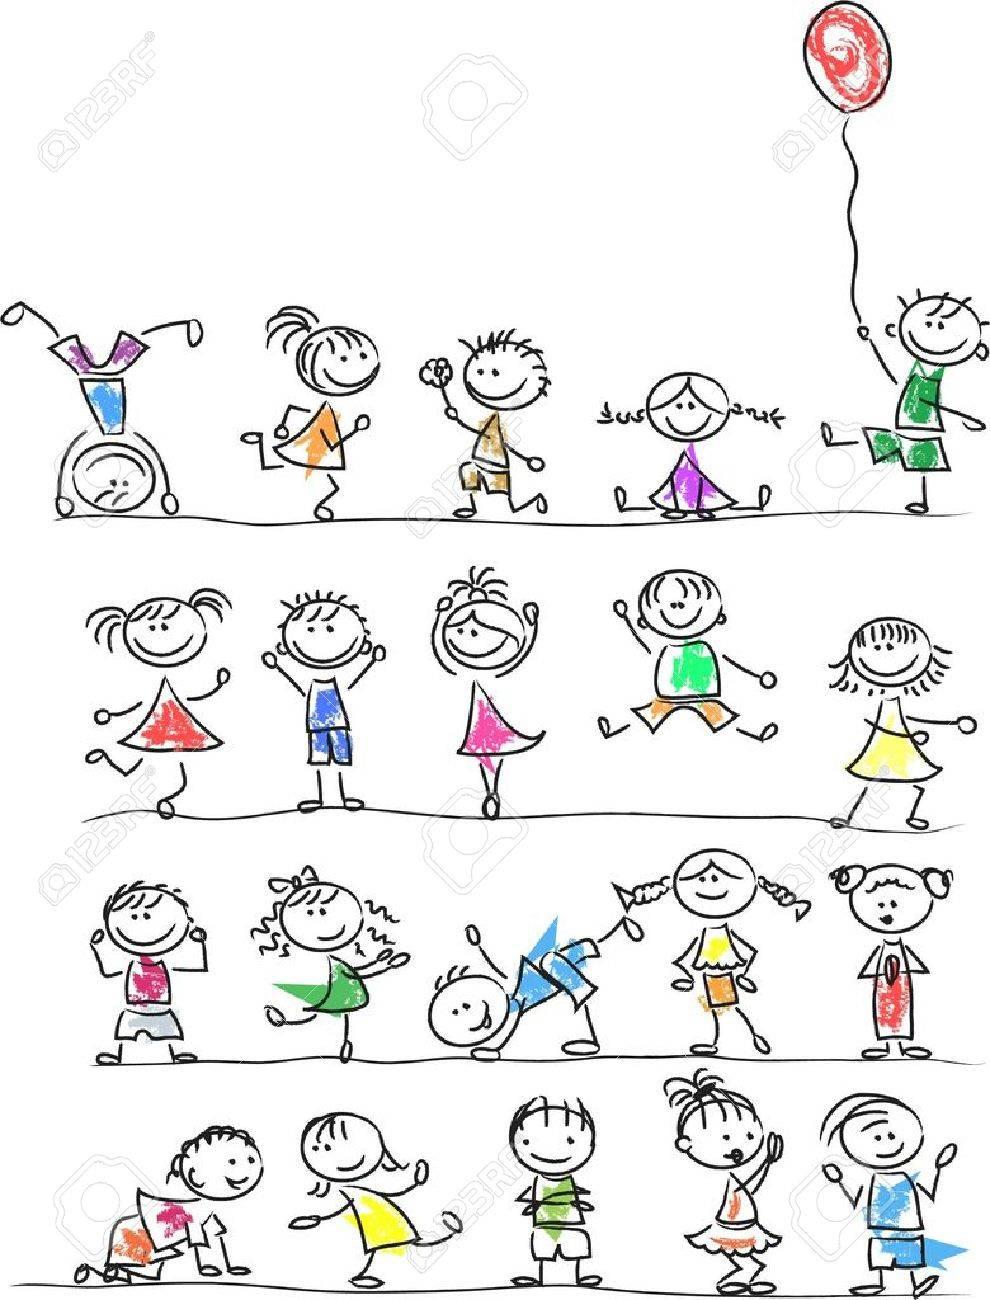 Cute happy cartoon kids - 14501423